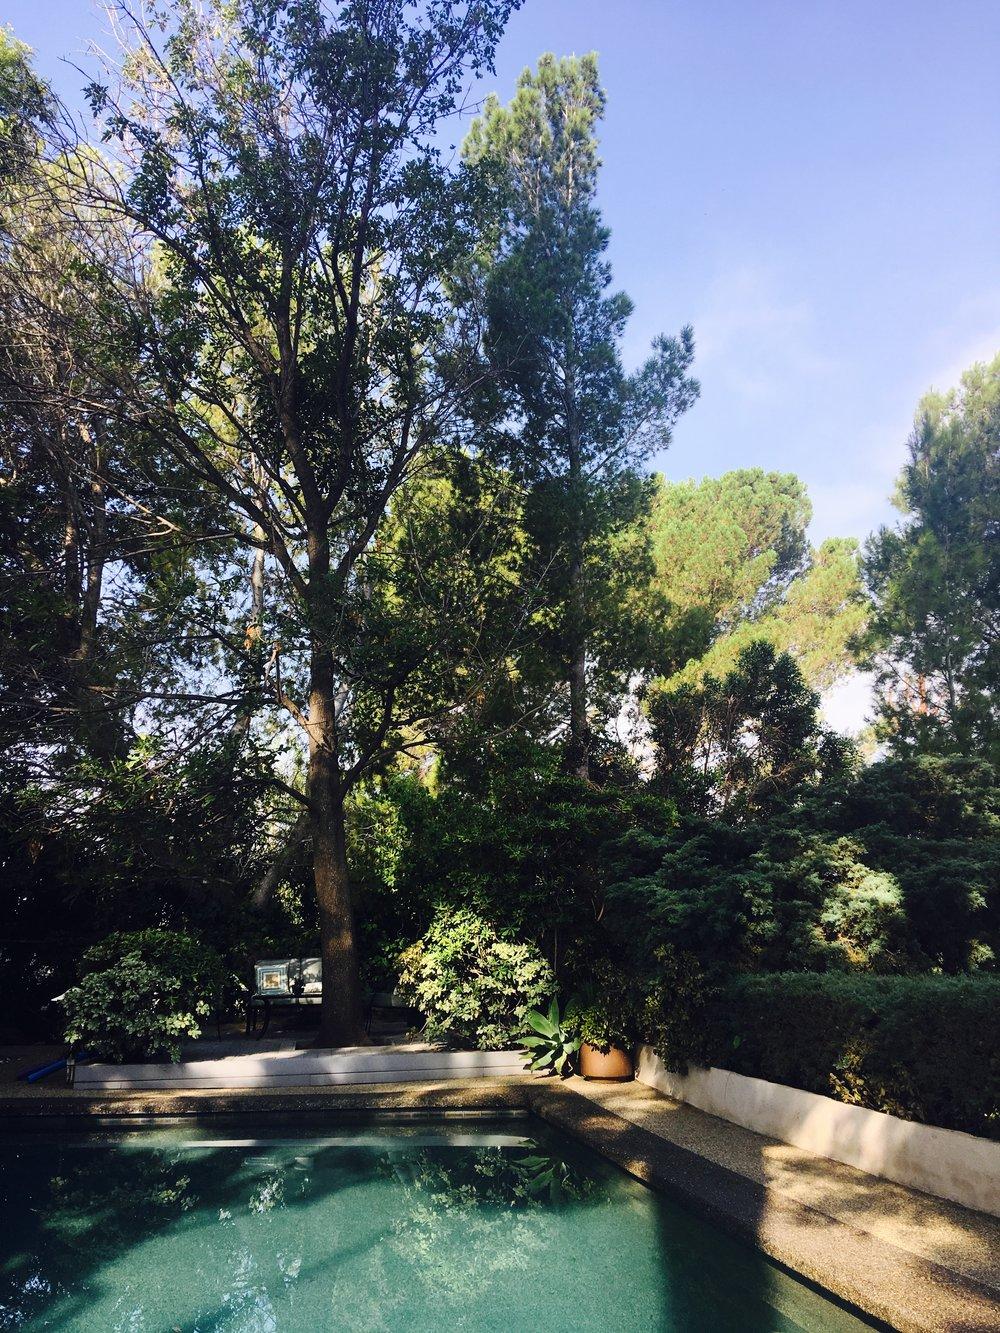 Gomelsky Eichler home, Granada Hills, CA